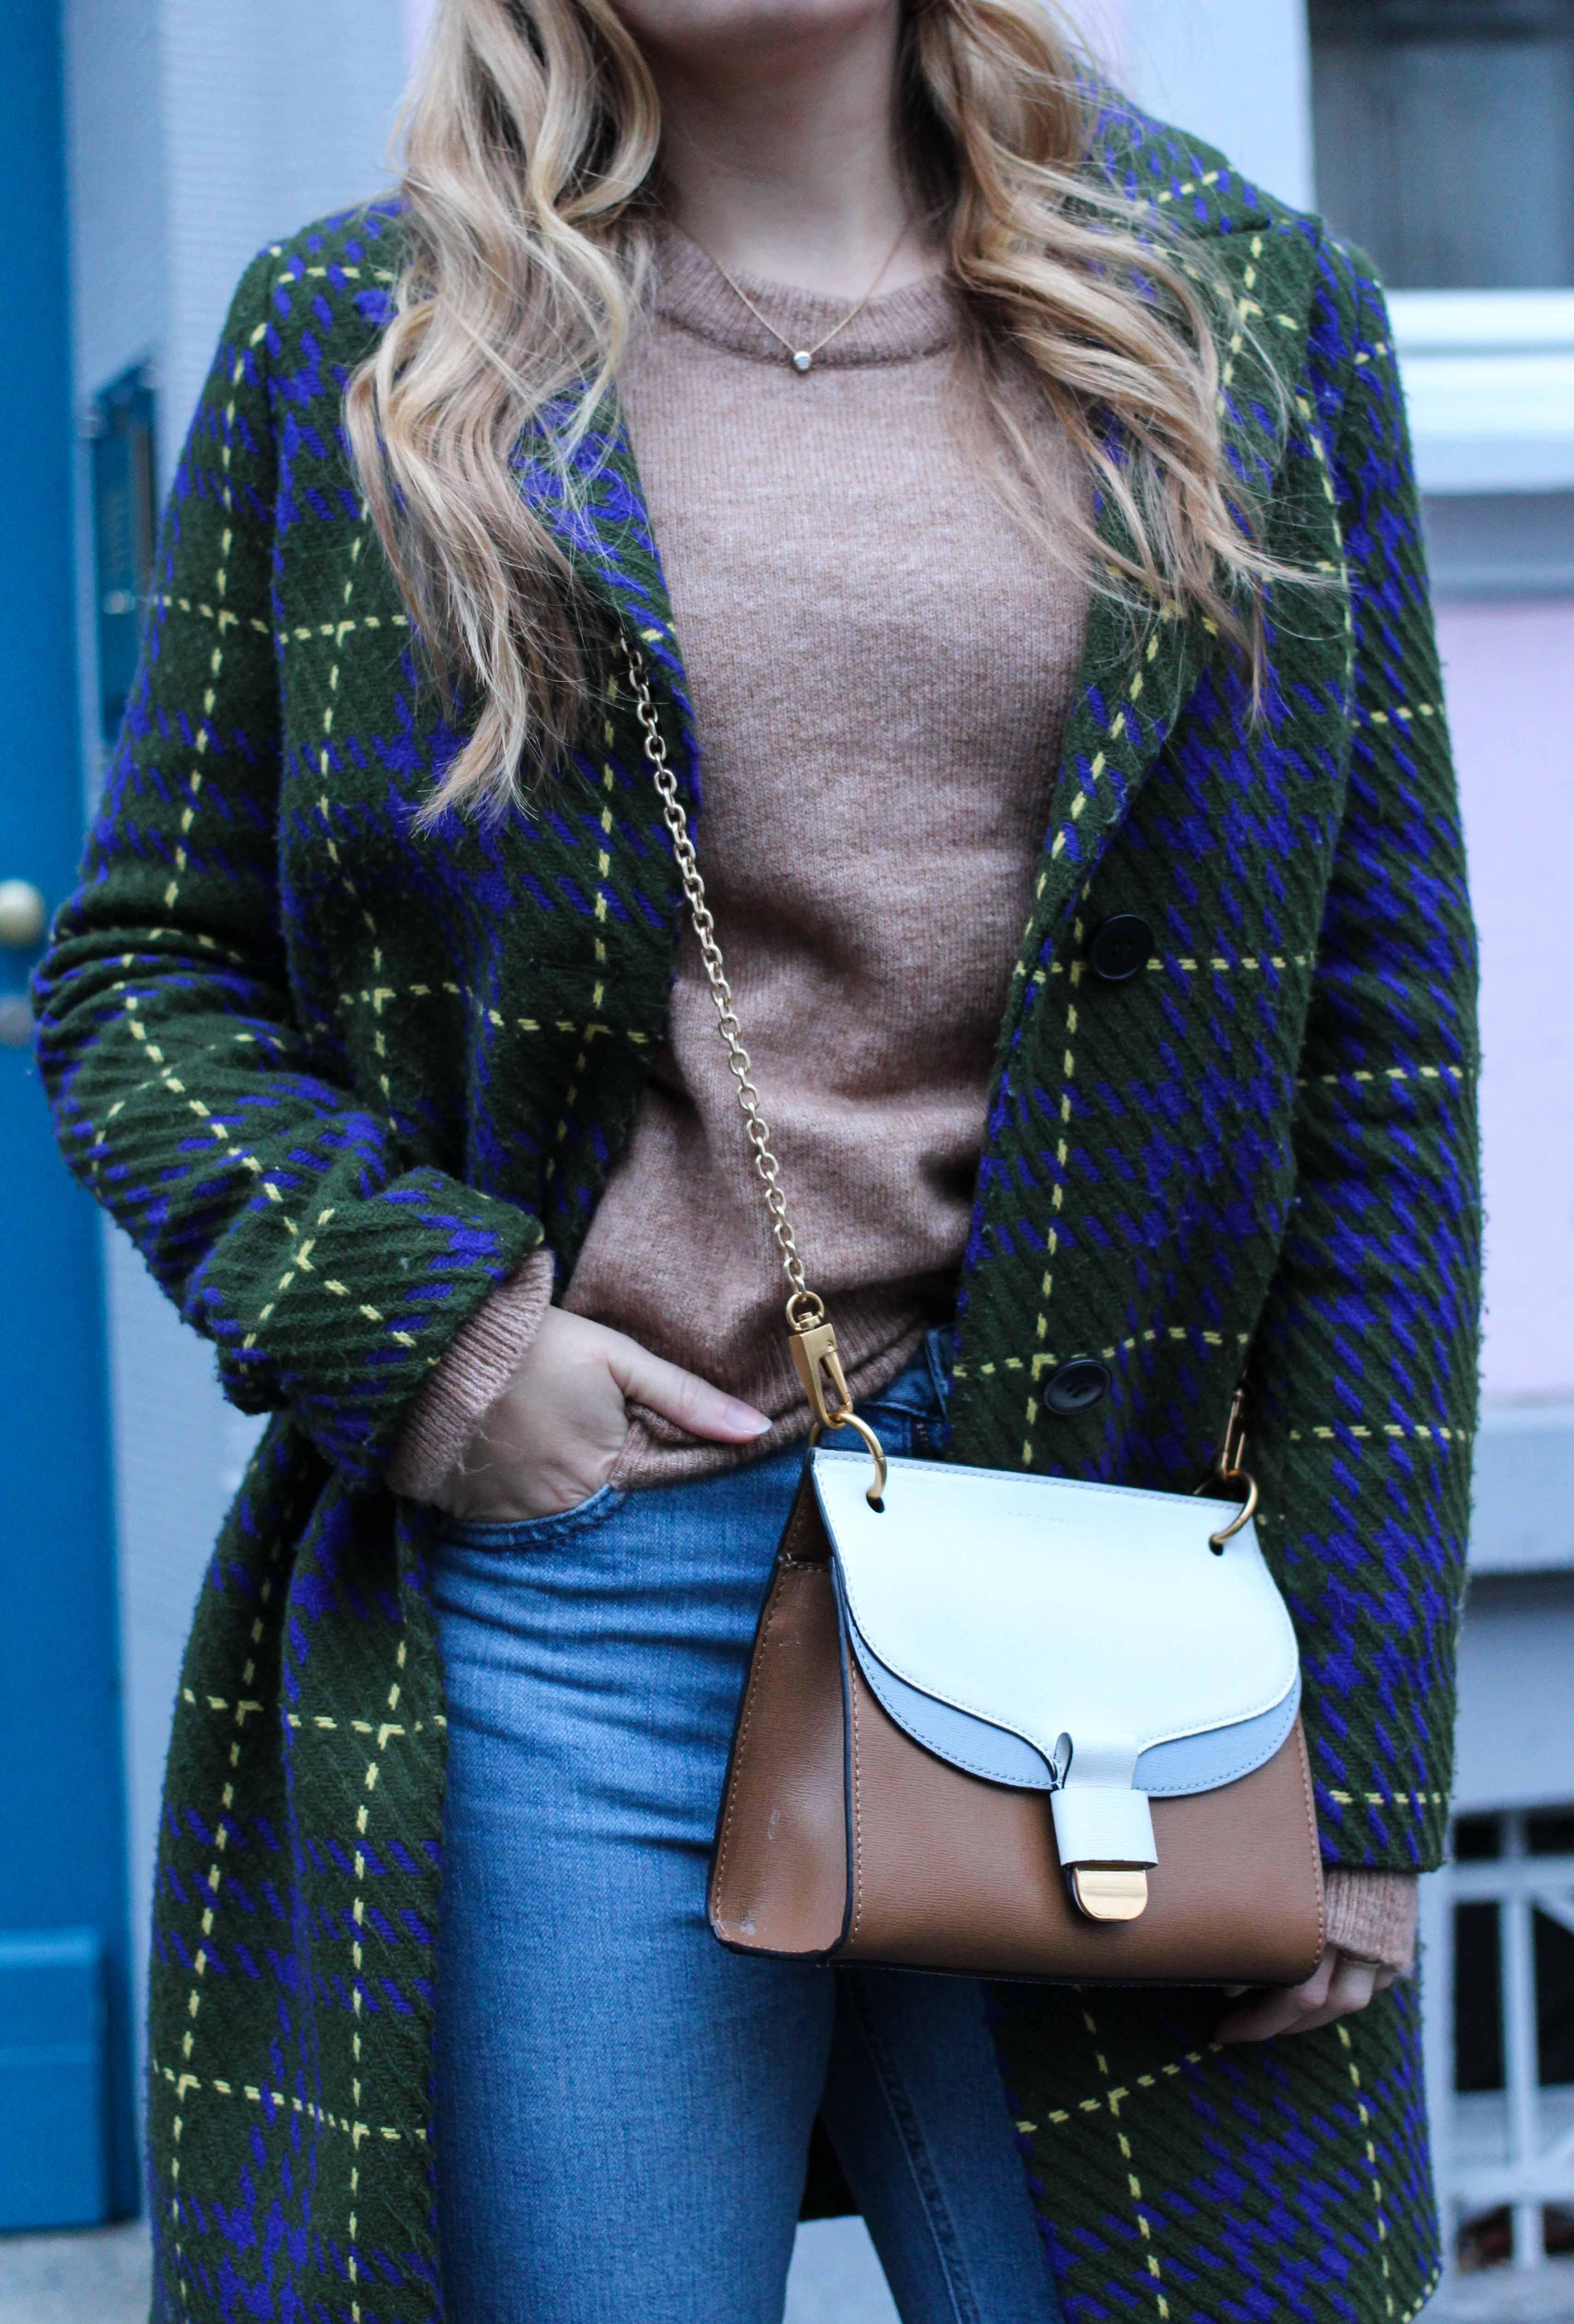 Herbst Must-Have 2019 Karomantel. Herbstmode Herbsttrend Mantel karriert Modeblog Outfit Herbst Fashion Blog Bonn 8